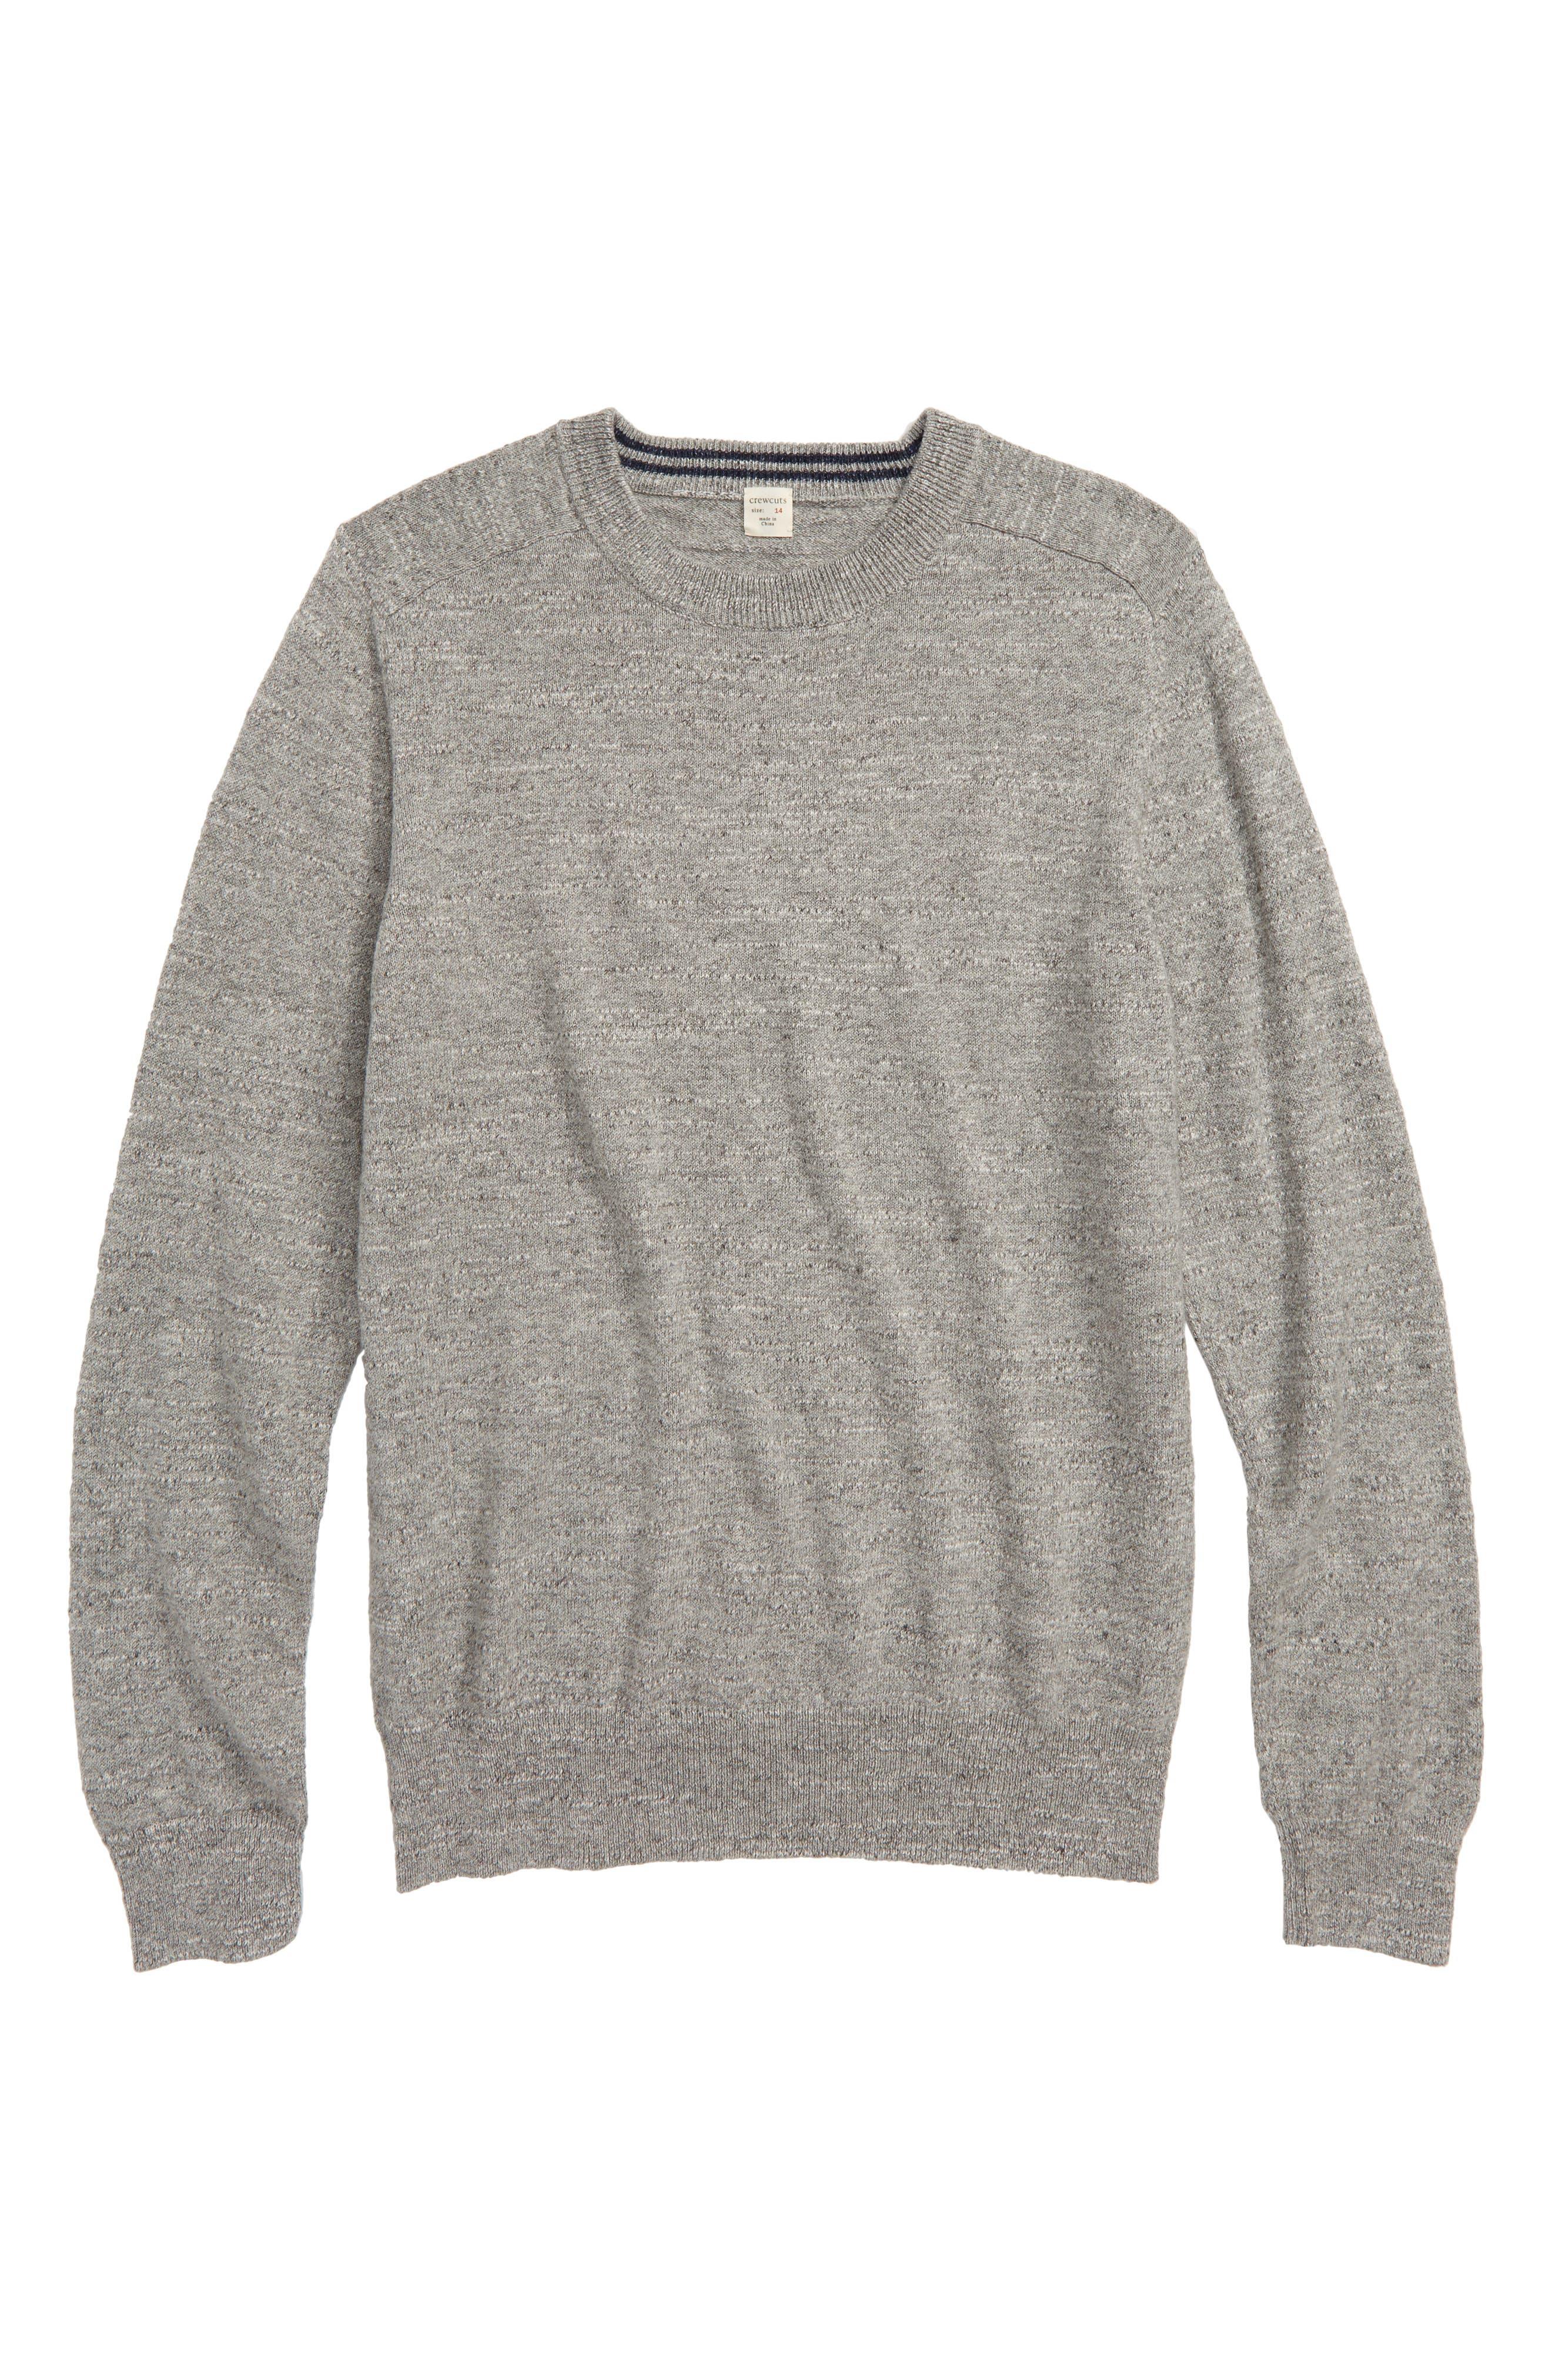 Cotton Crewneck Sweater,                             Main thumbnail 1, color,                             HEATHER GREY INDIGO